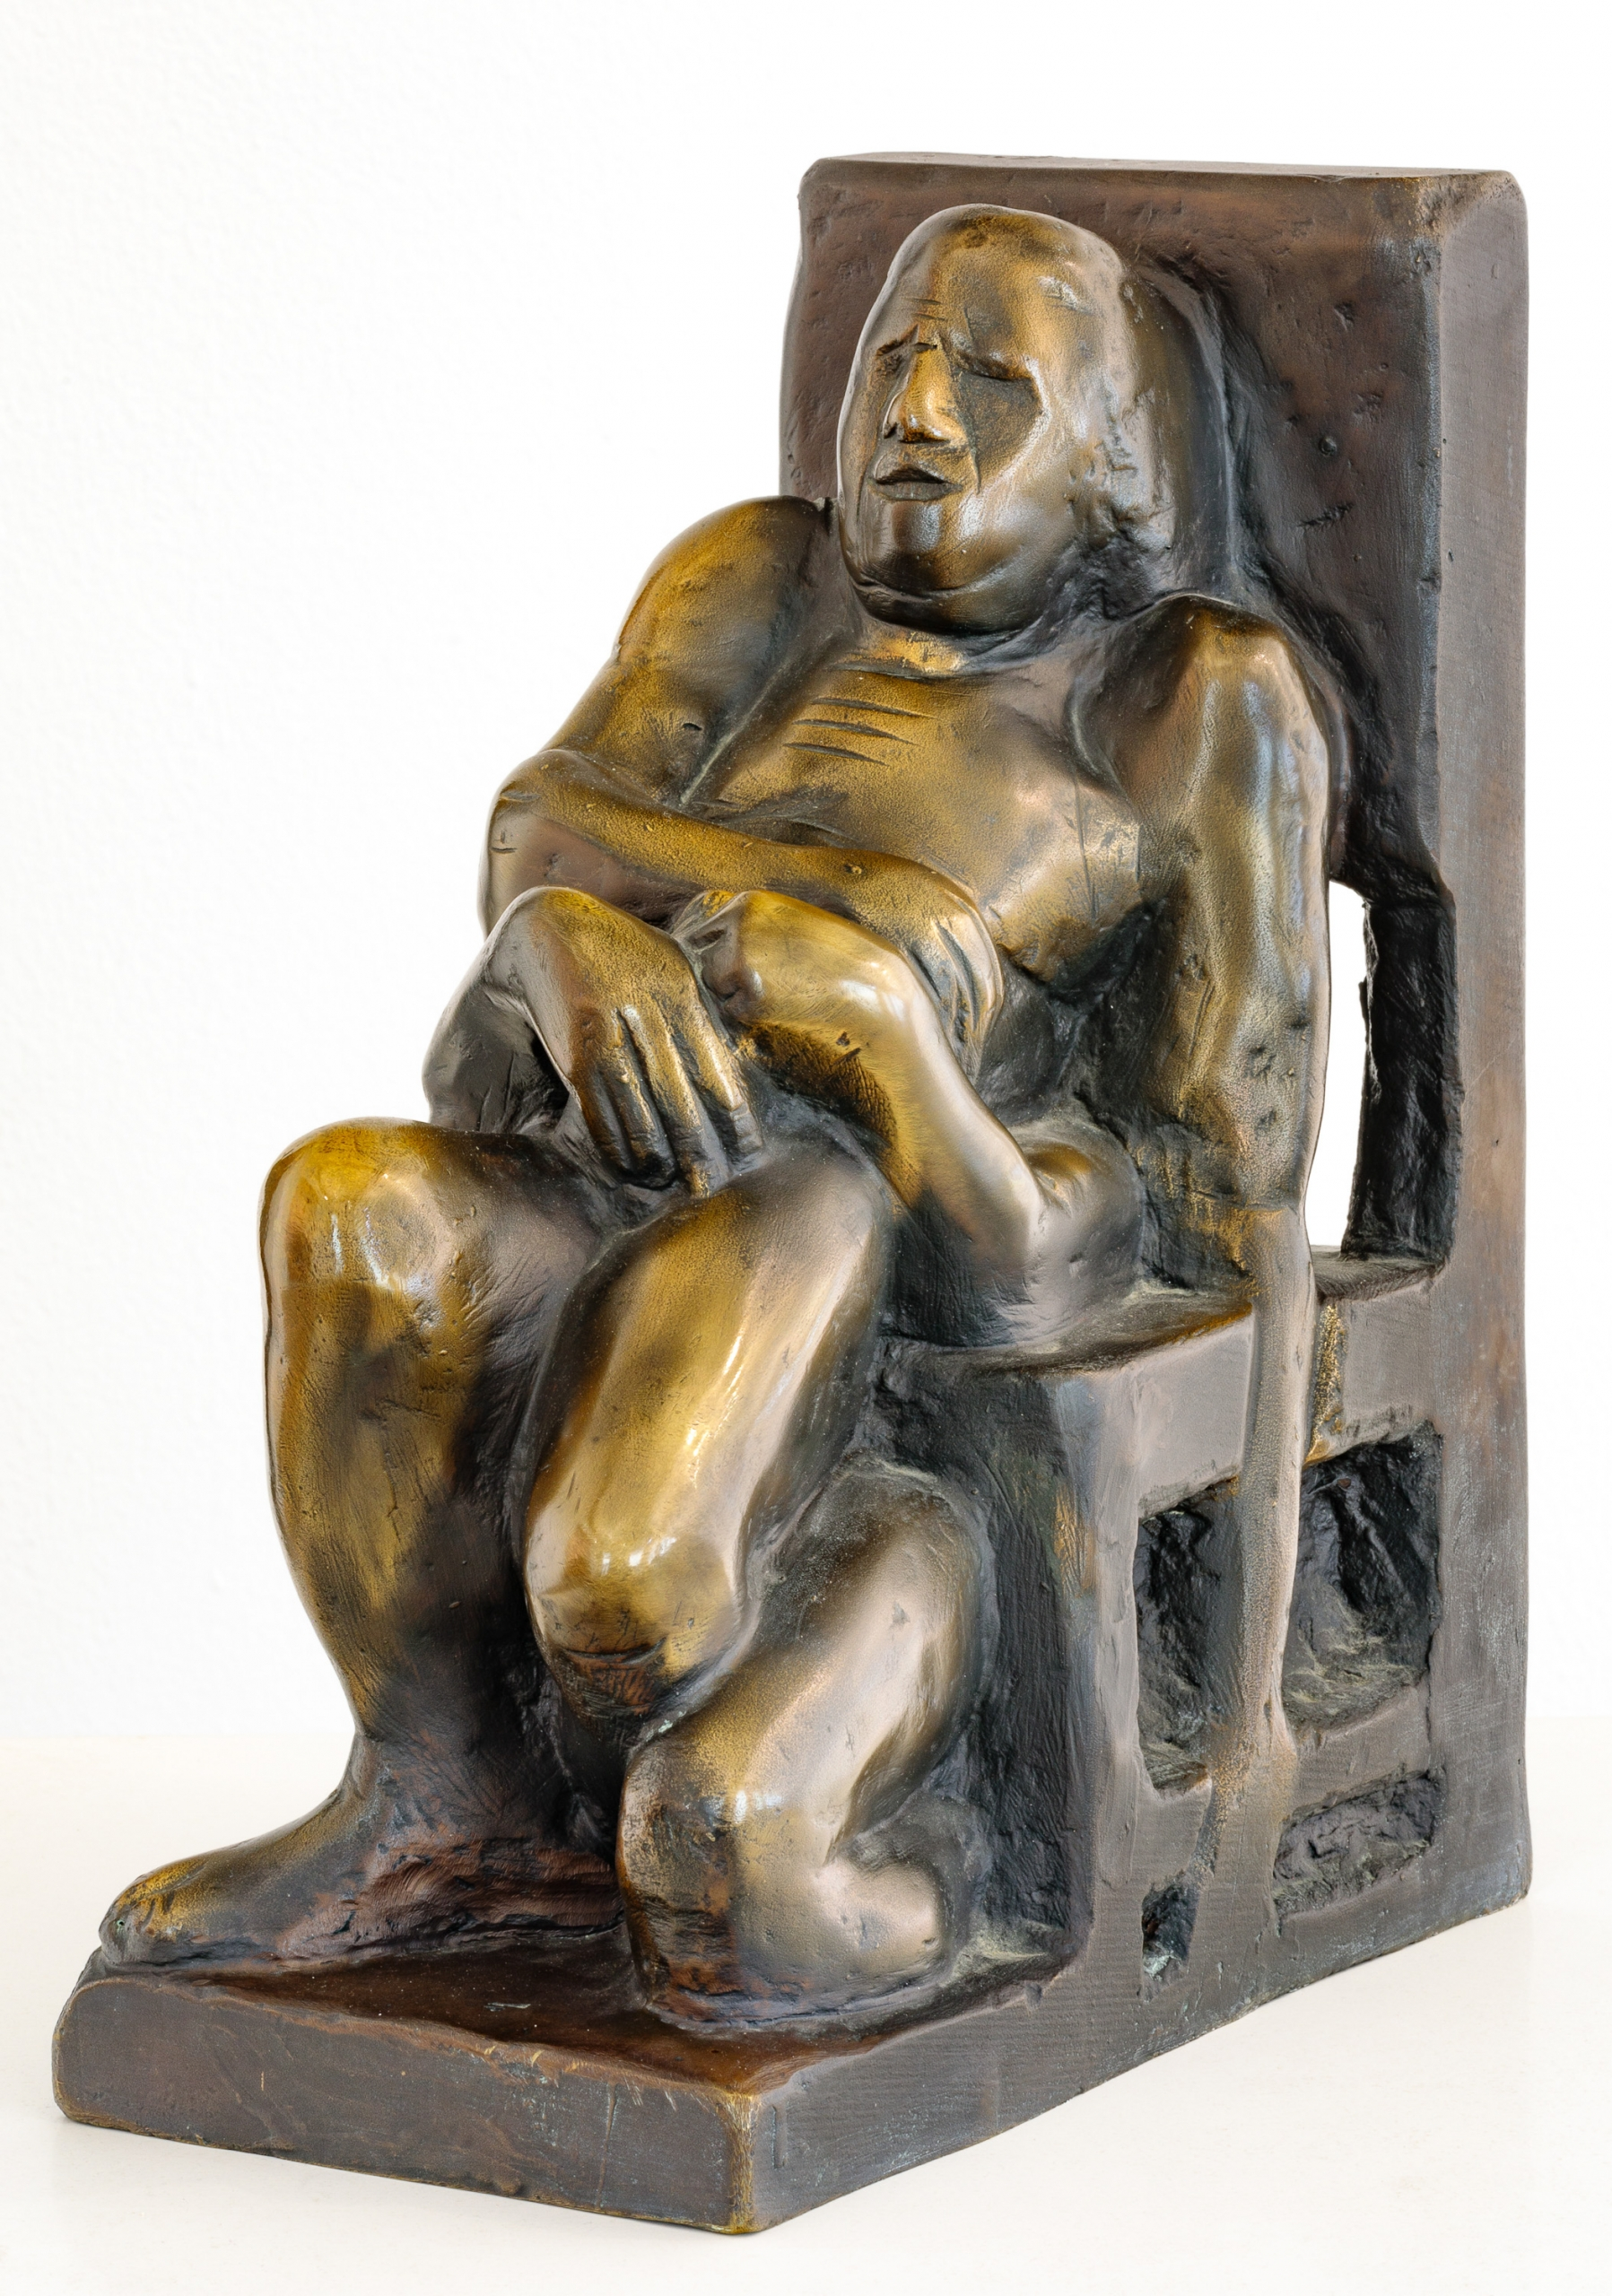 Alfred Hrdlicka, Randolectil Hamlet (Themenkreis)